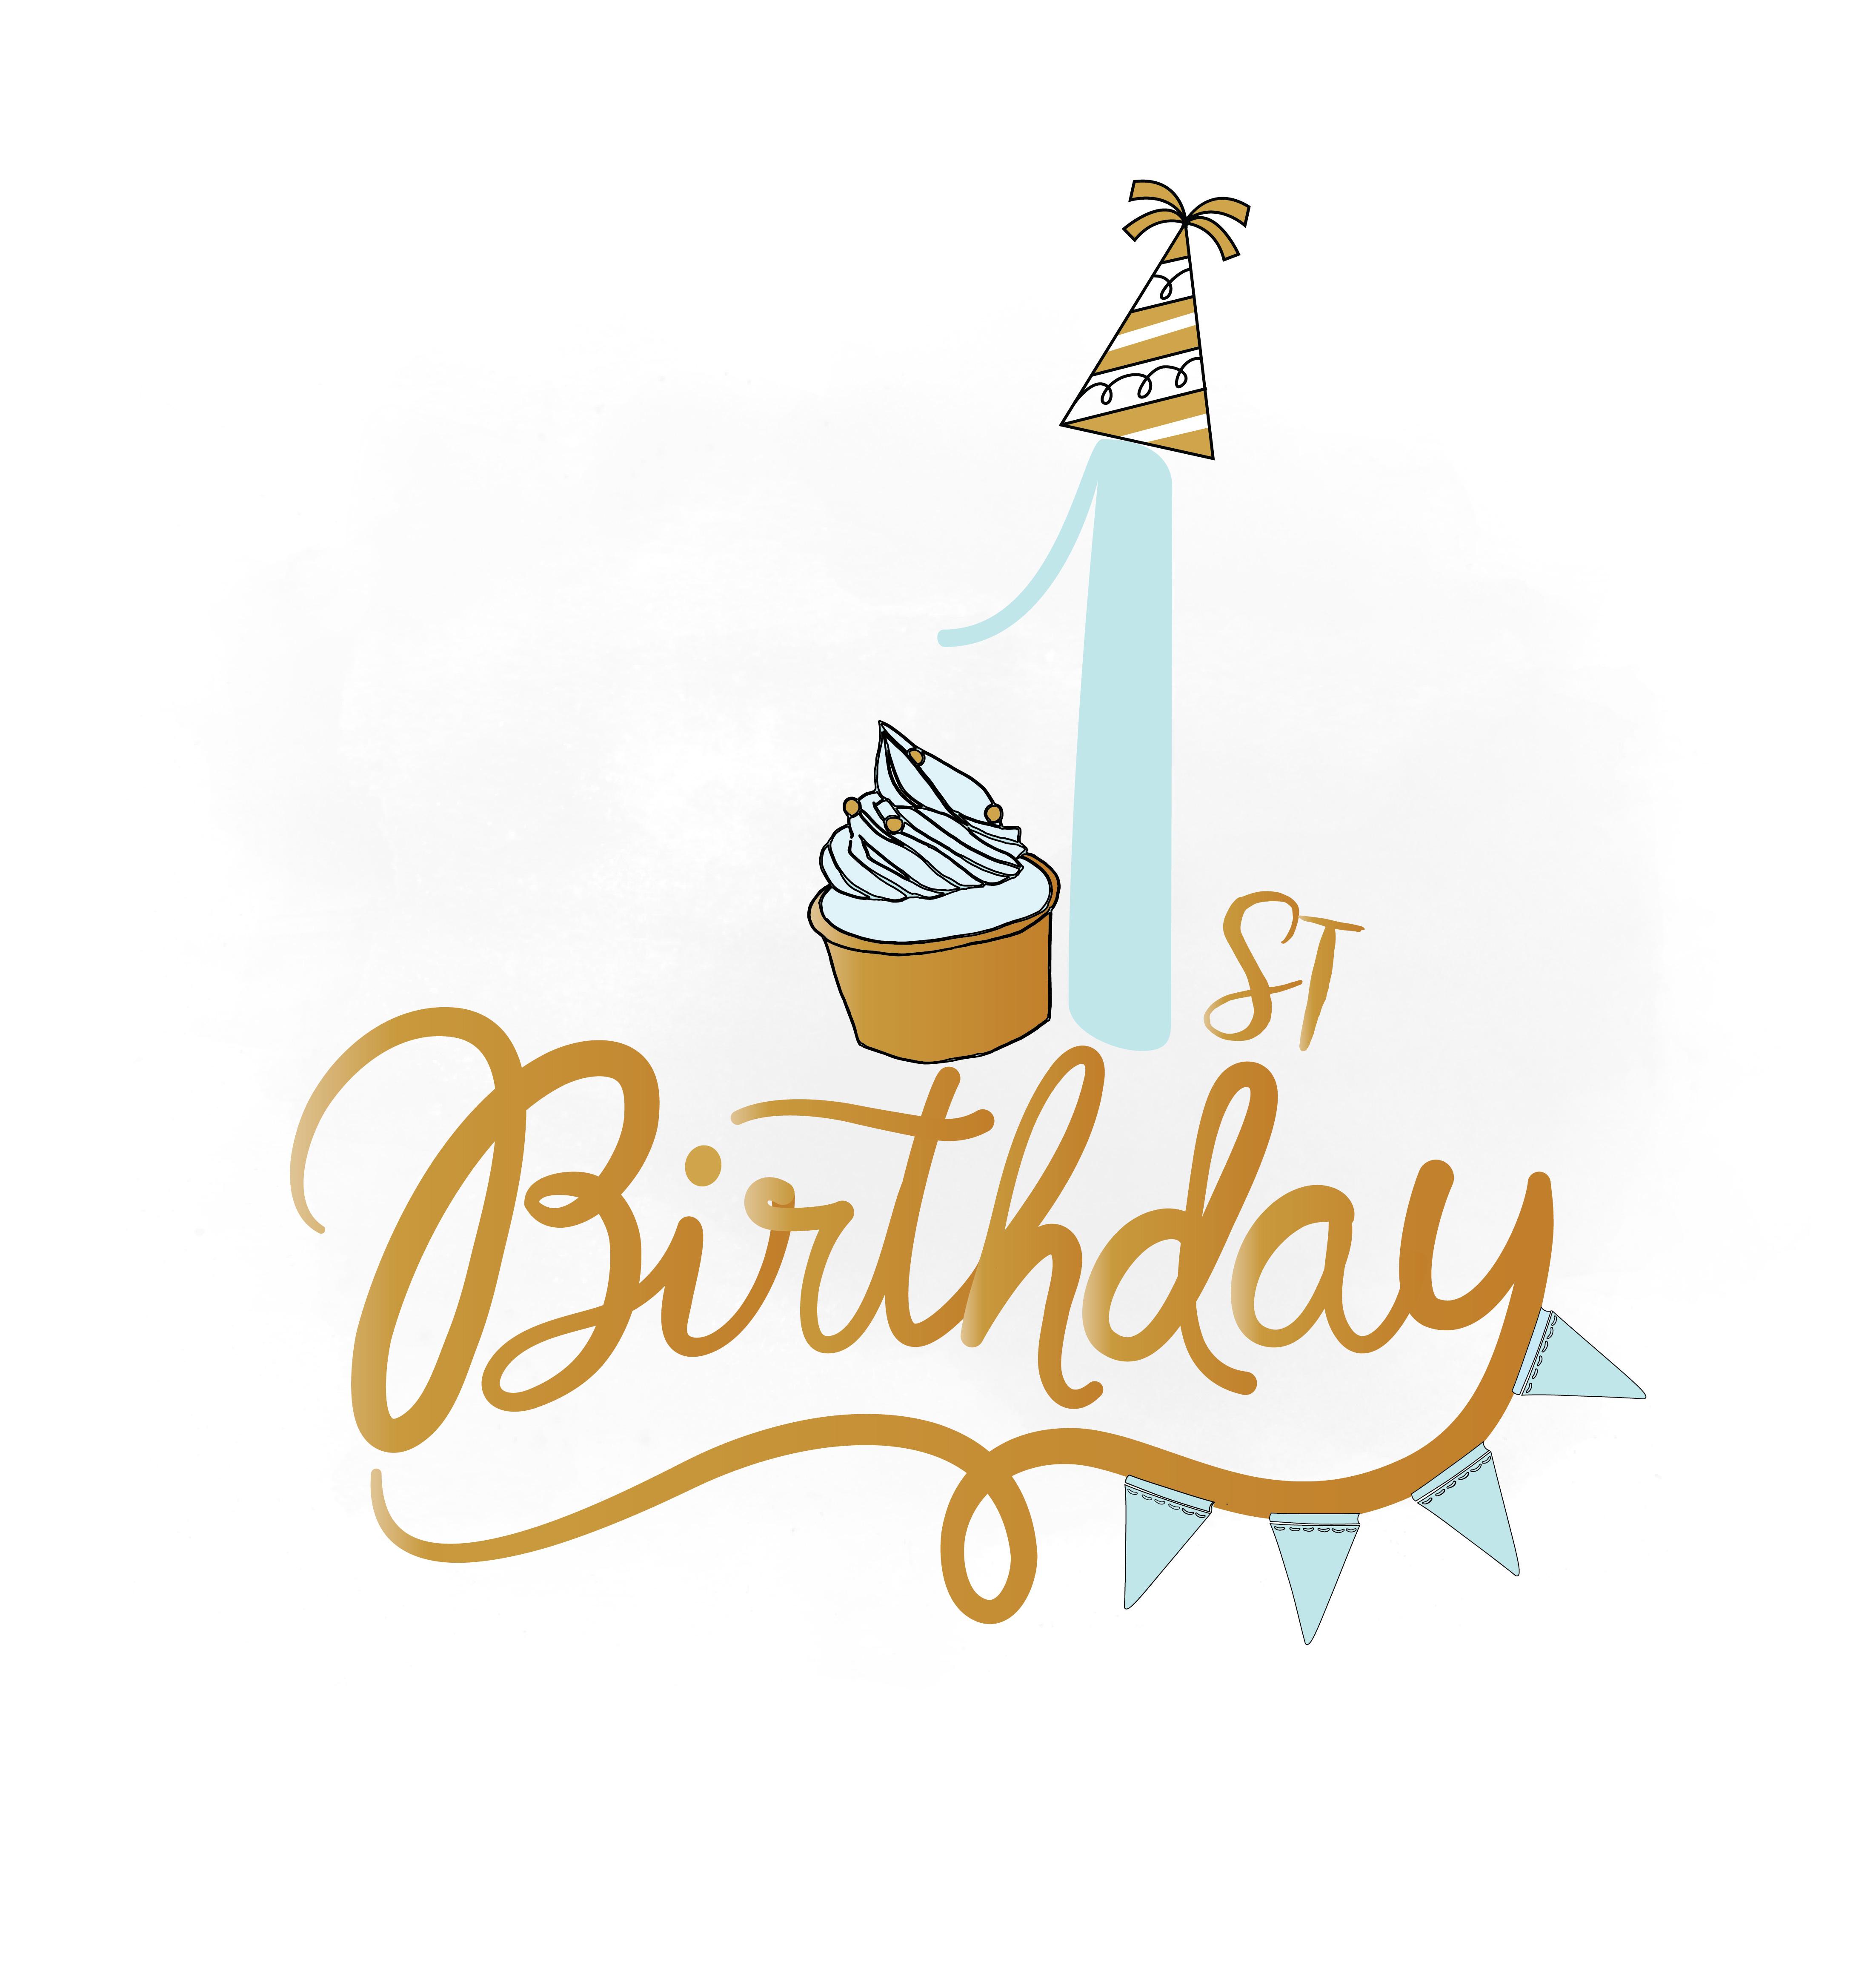 1st birthday svg clipart baby boy birt design bundles rh designbundles net 1st birthday clipart images 1st birthday cake clipart